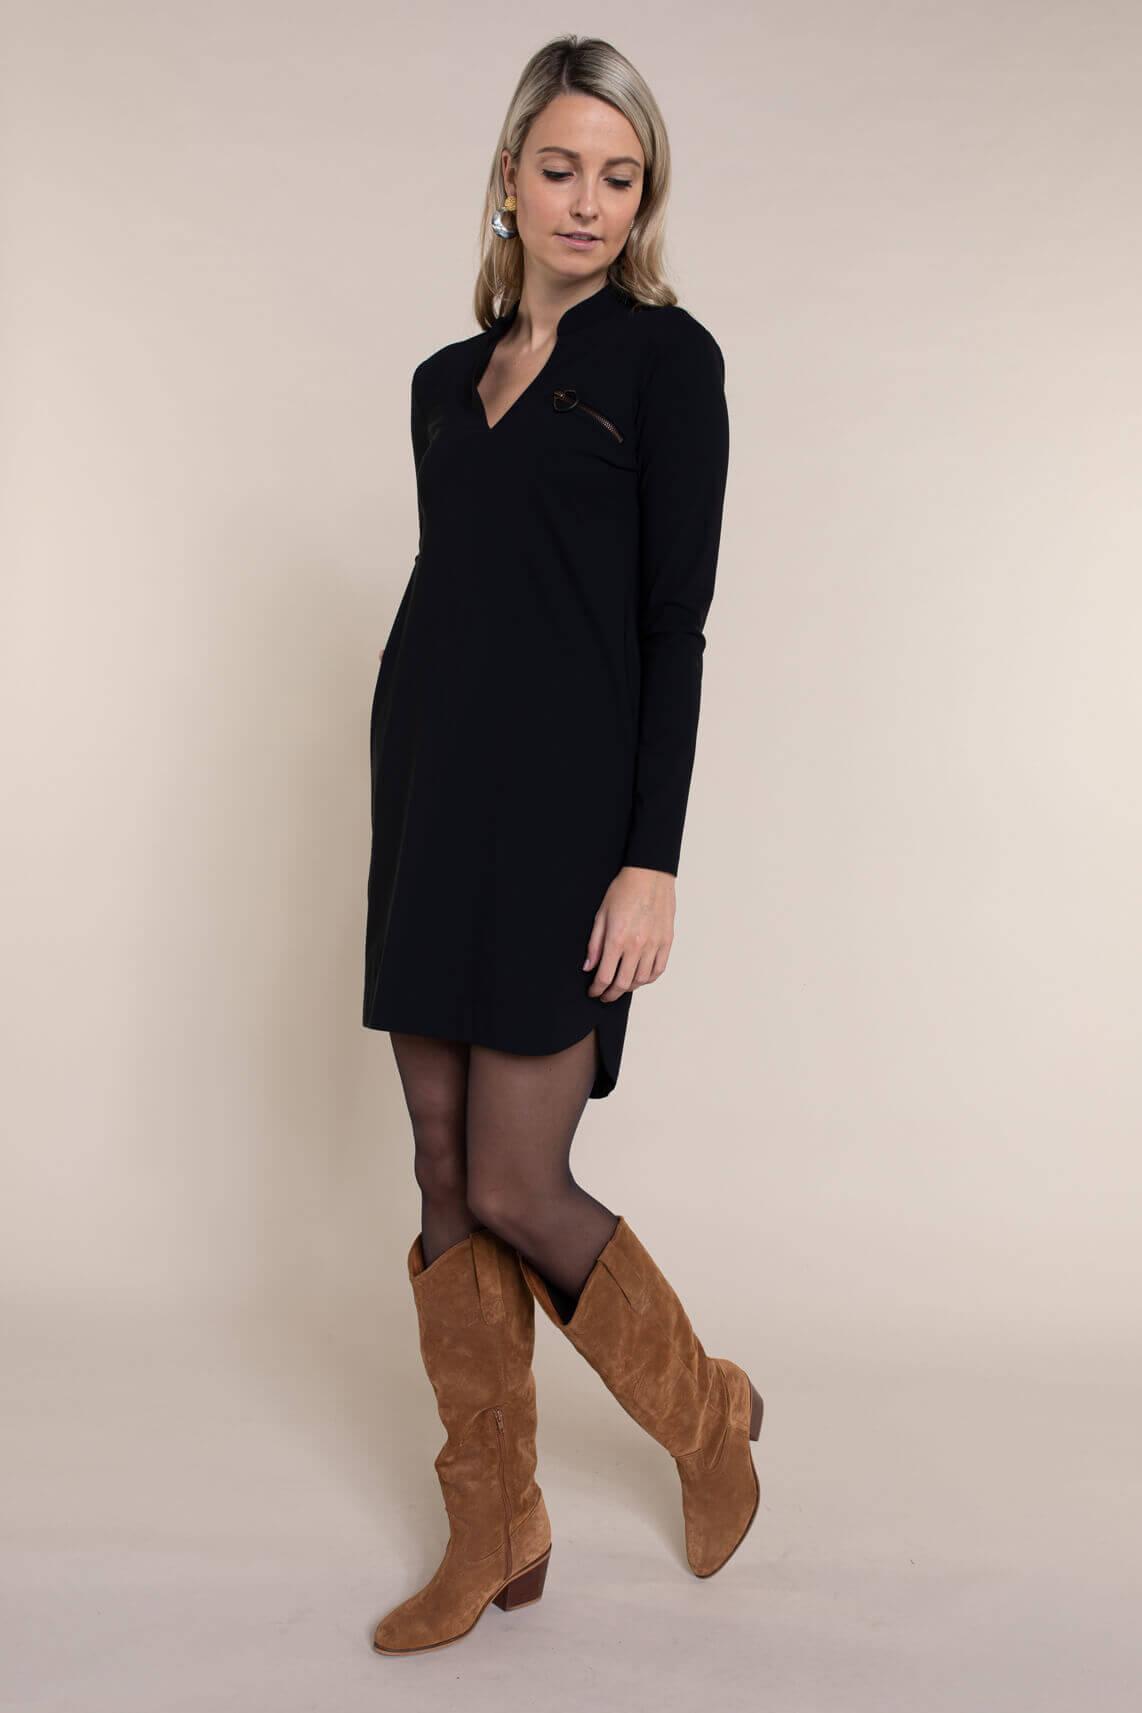 Jane Lushka Dames Gerrie jurk zwart